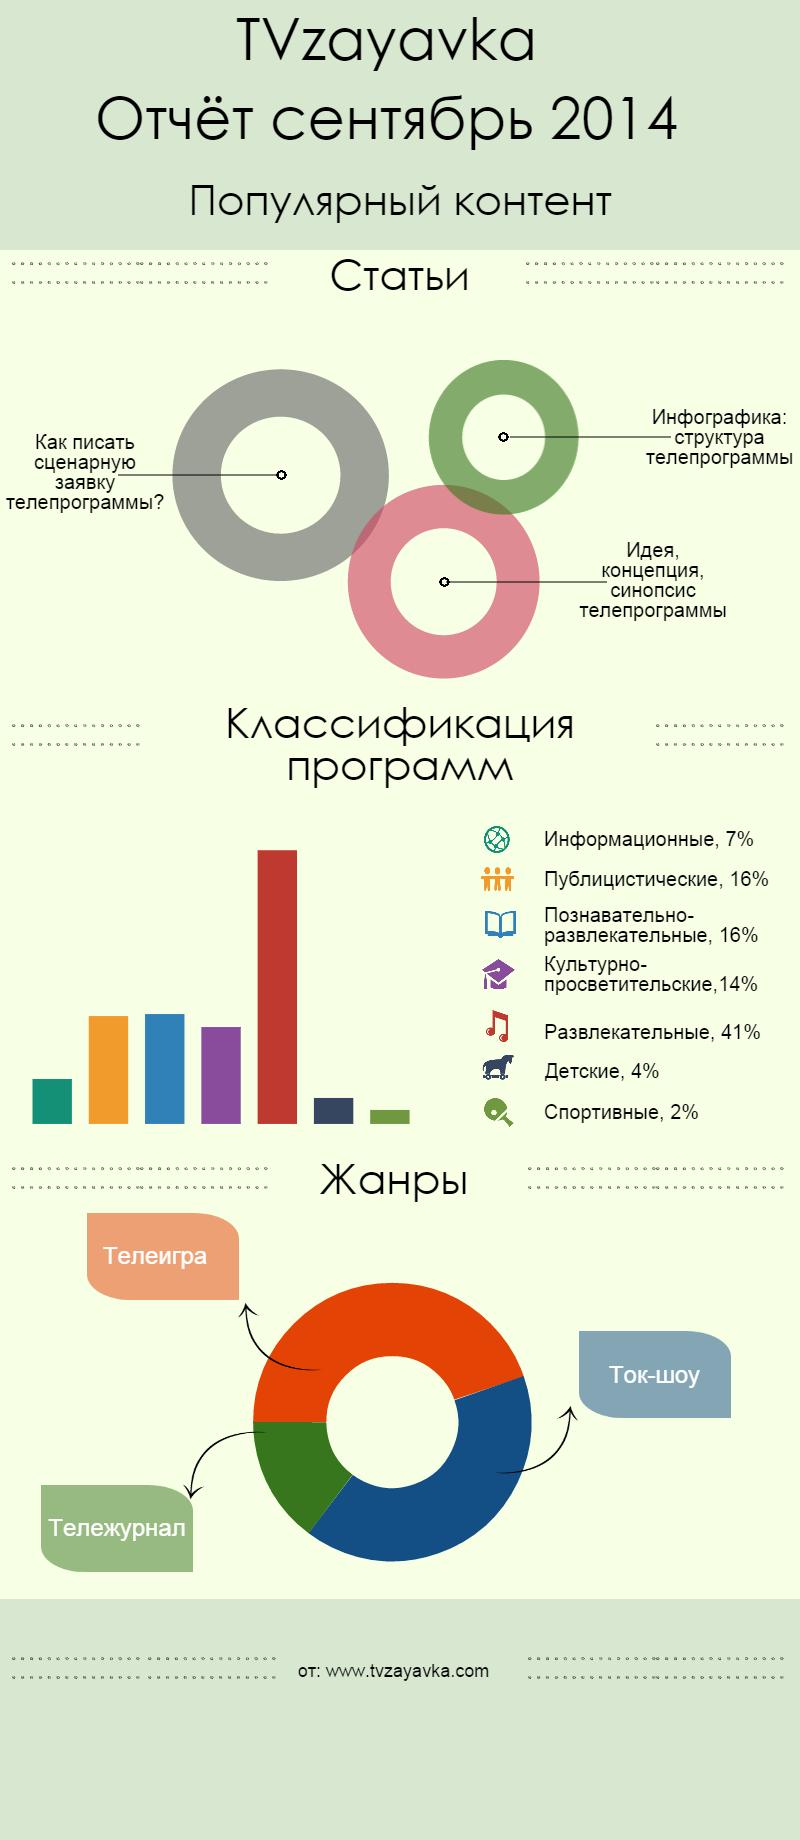 TVzayavka: популярный контент